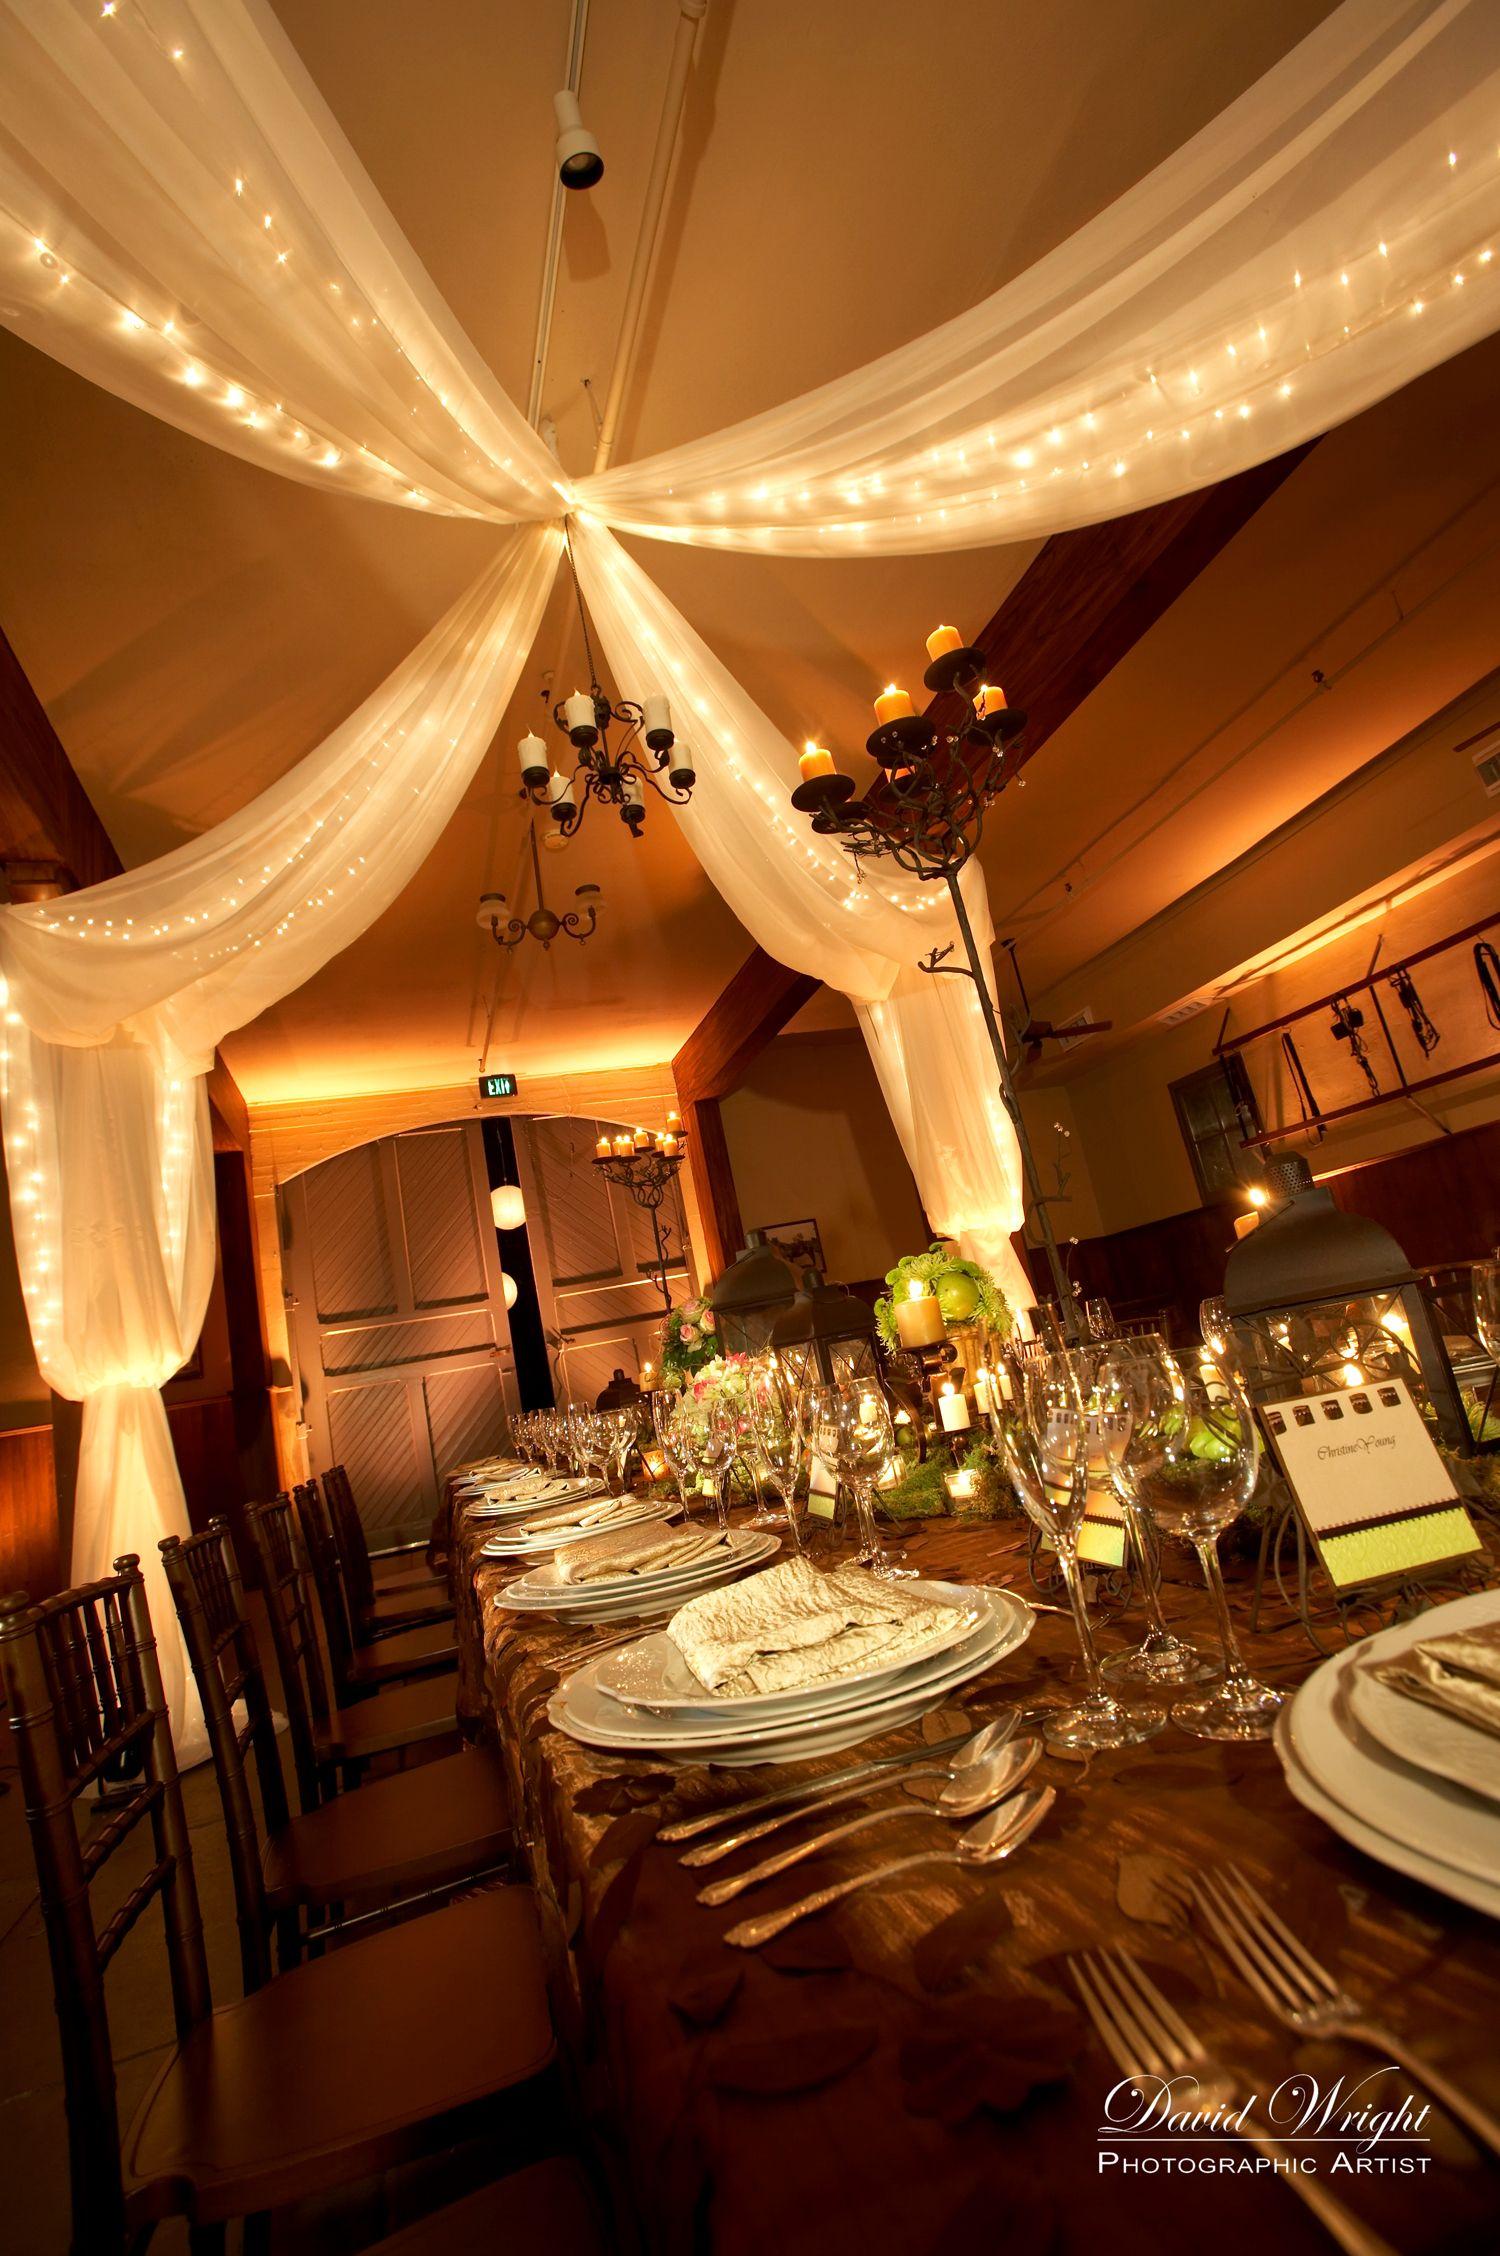 Decorative lights for weddings - Engagement